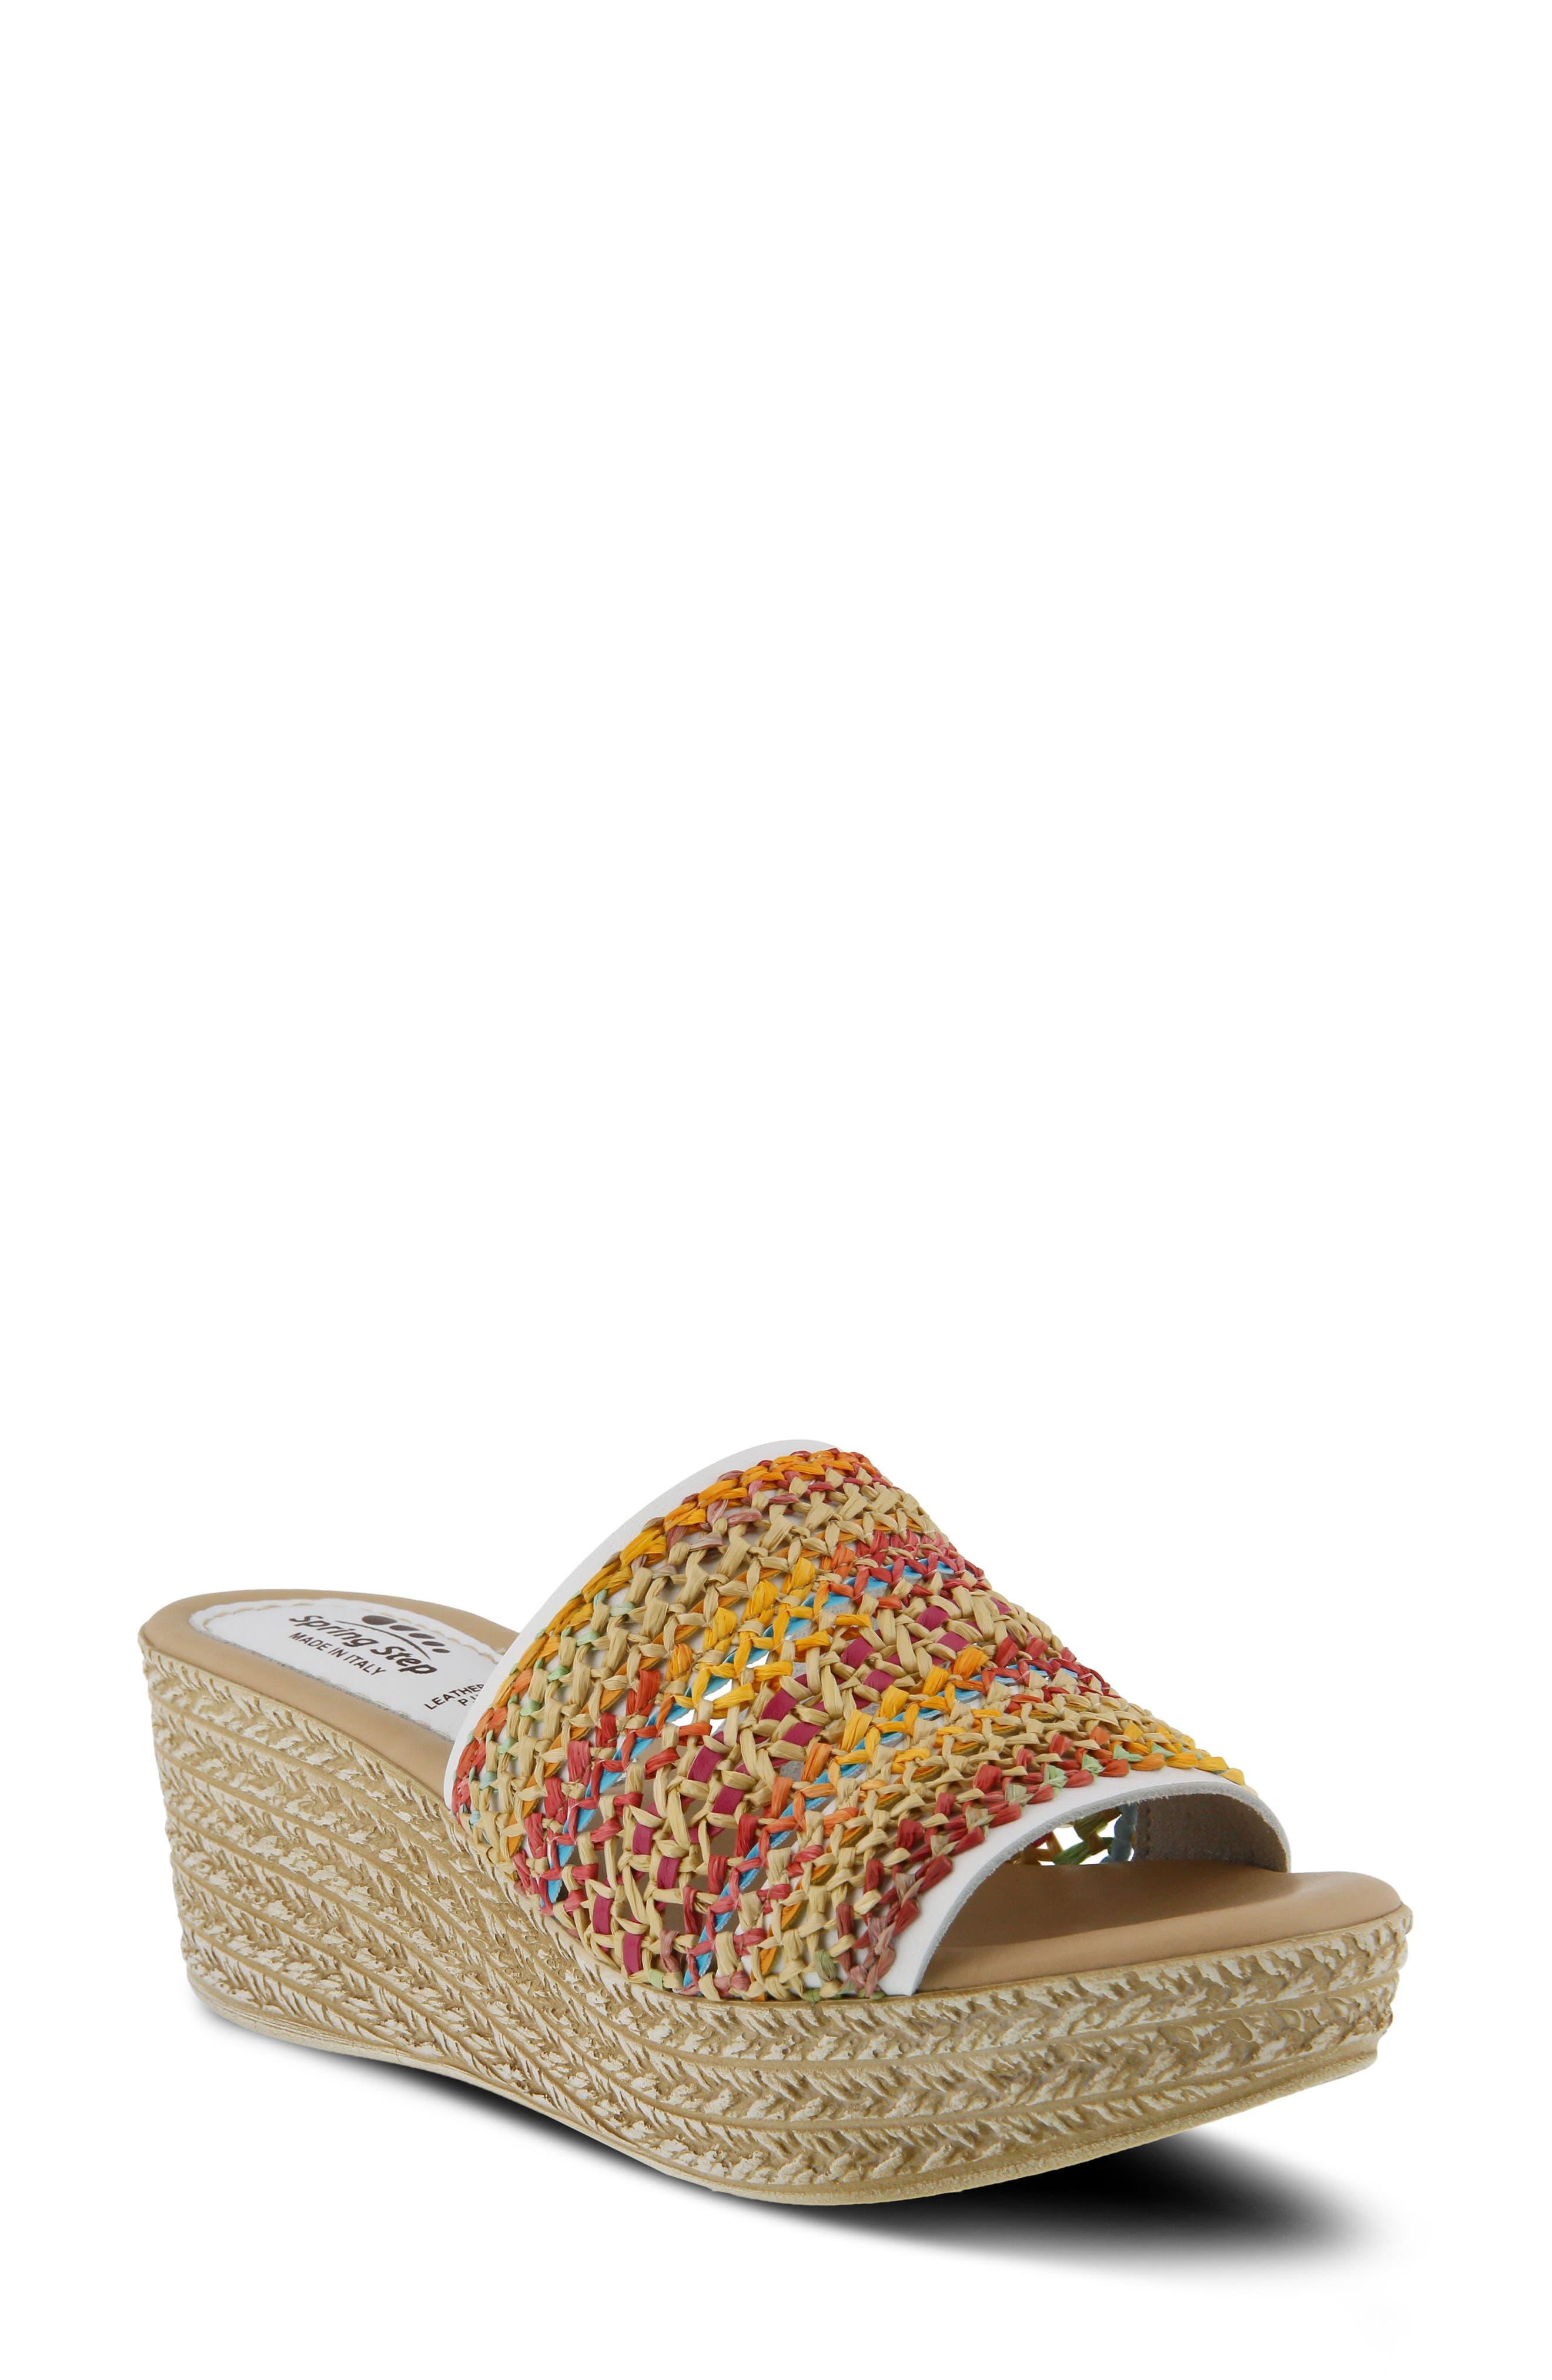 Calci Espadrille Wedge Sandal,                             Main thumbnail 1, color,                             White Leather